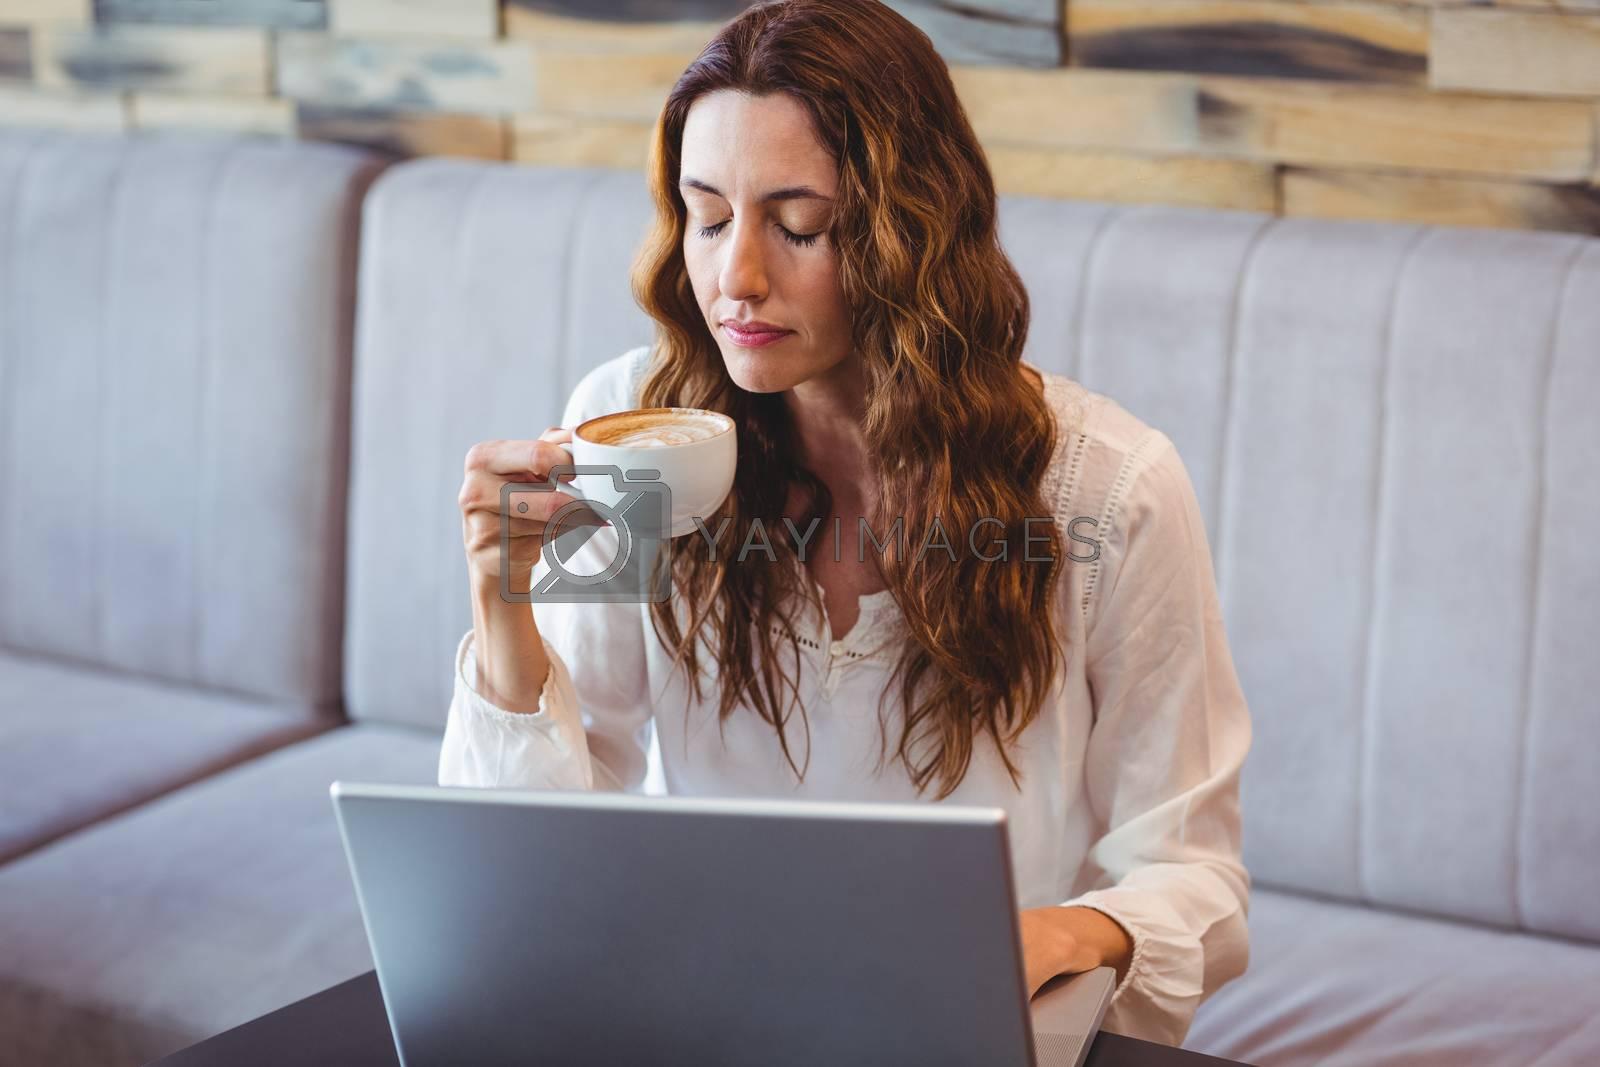 Royalty free image of Pretty brunette having coffee using laptop by Wavebreakmedia